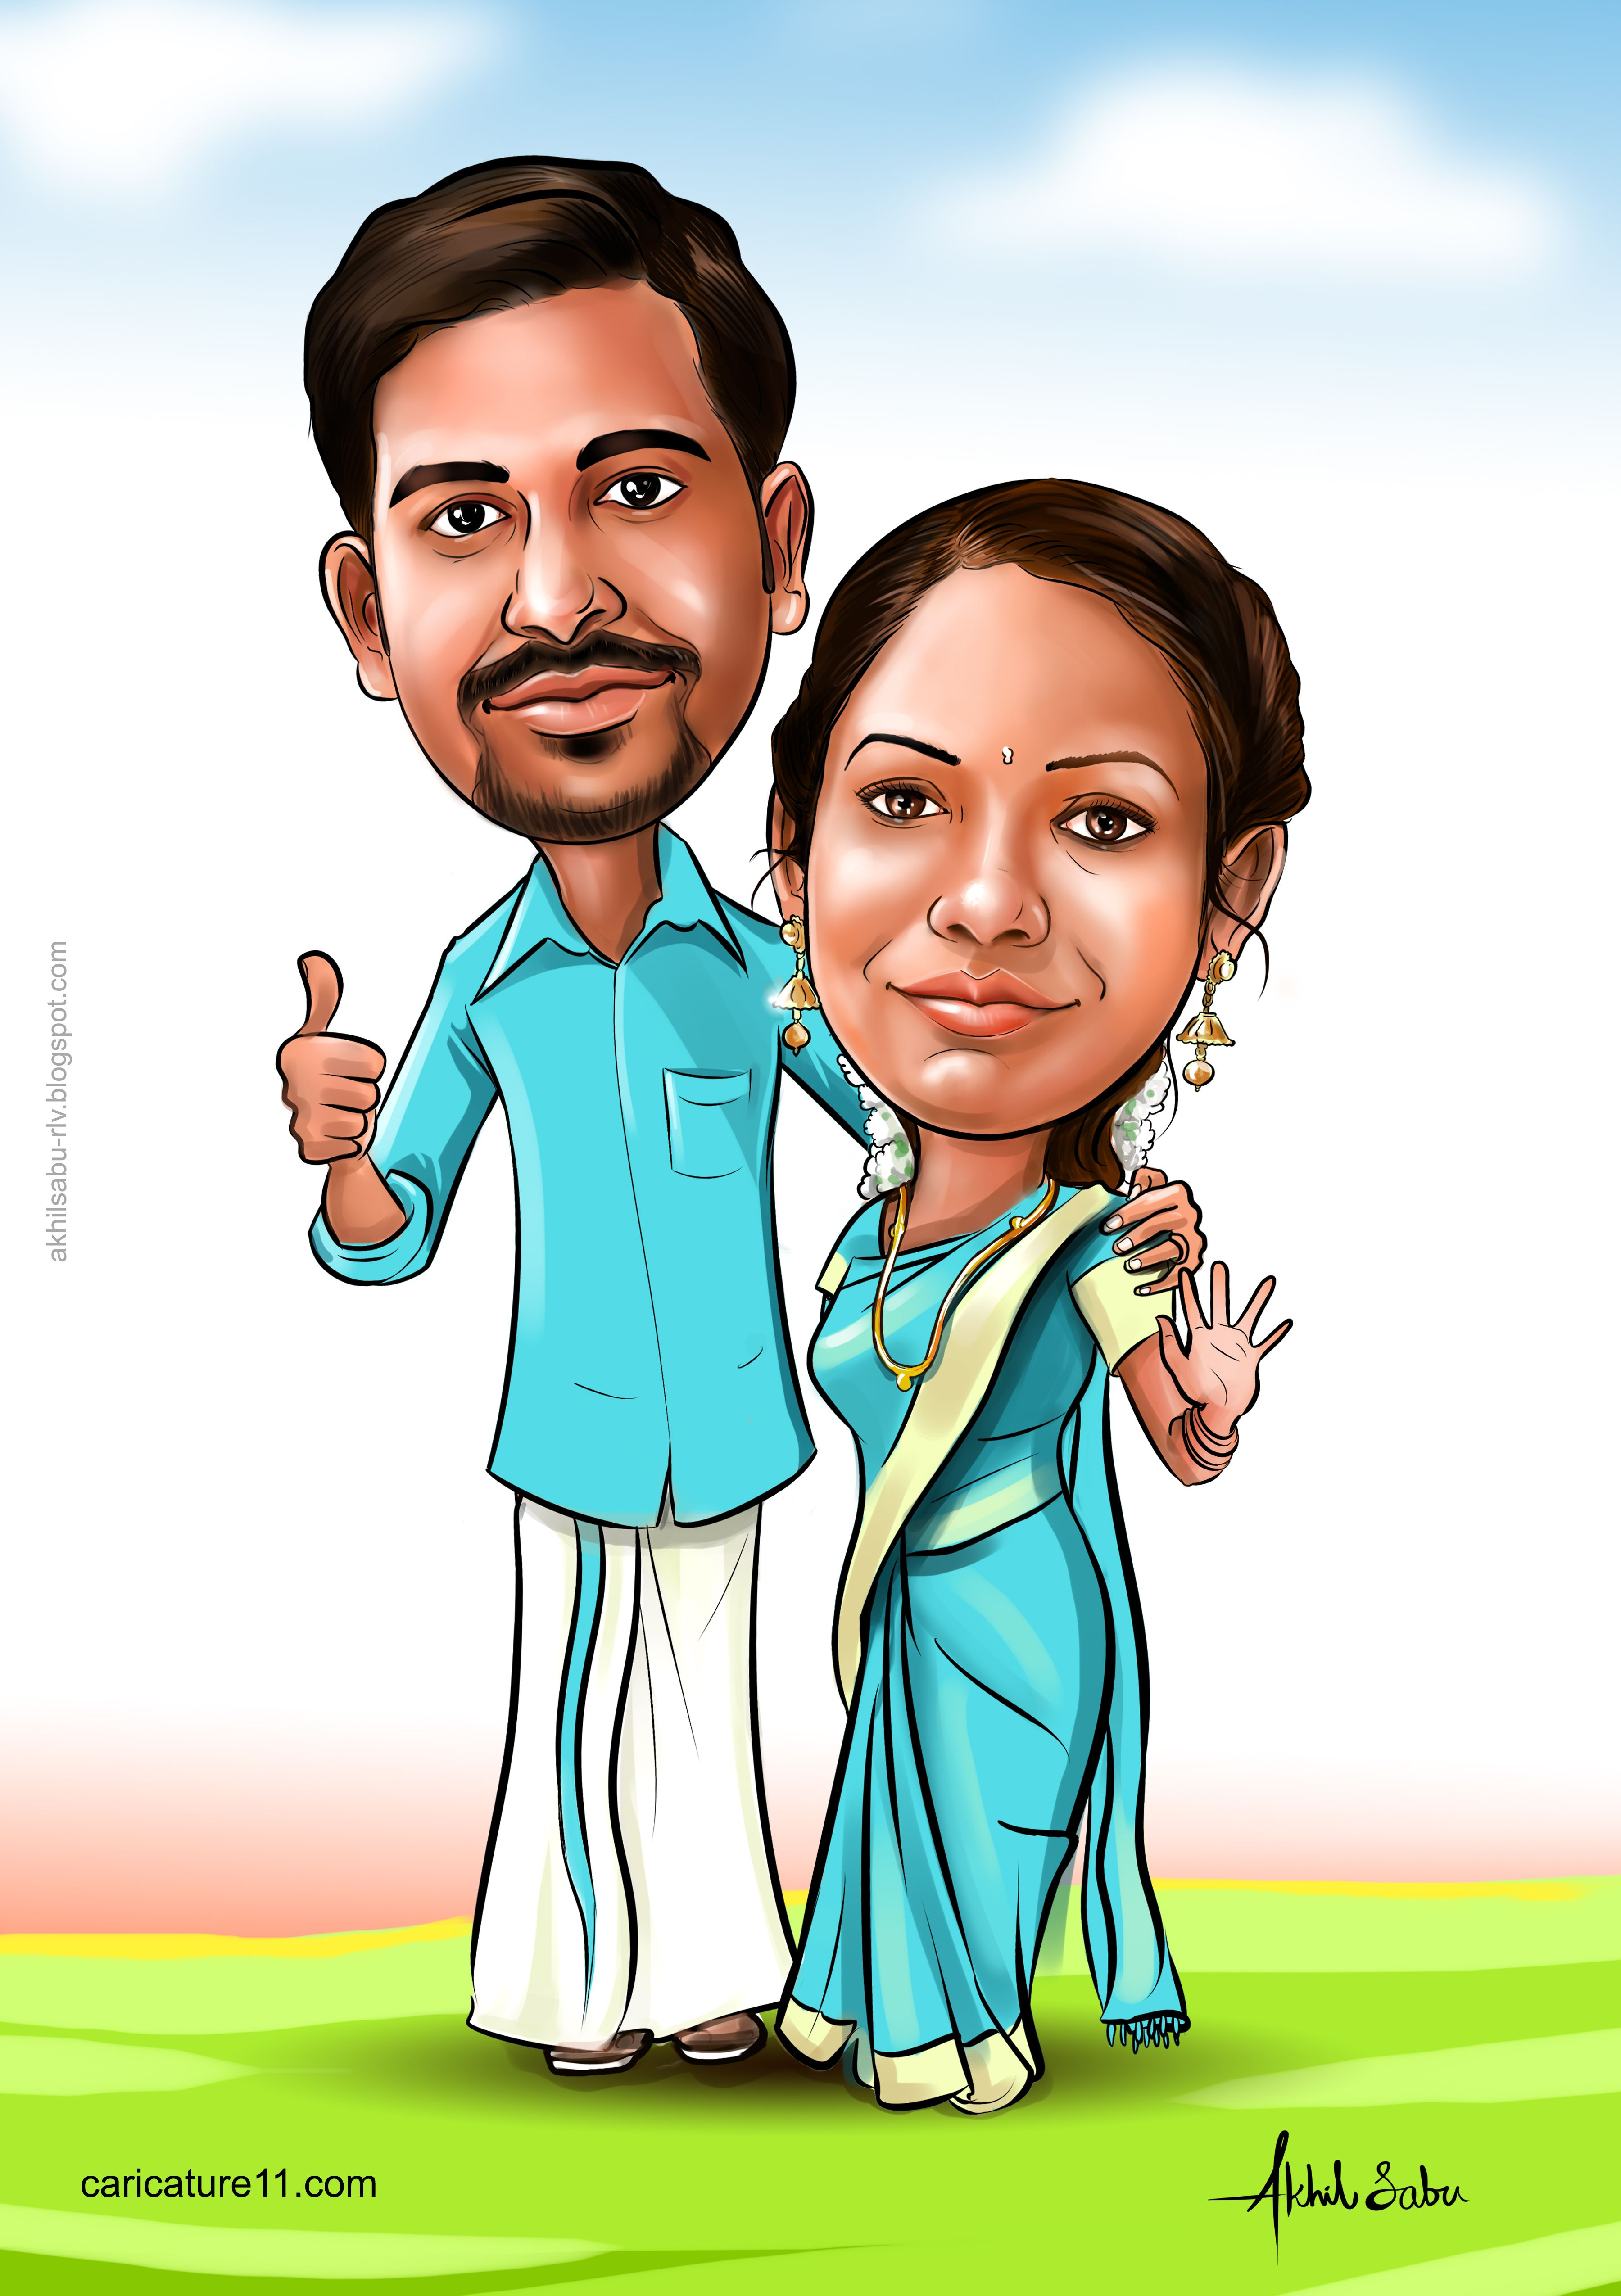 India wedding caricature Wedding caricature, Caricature